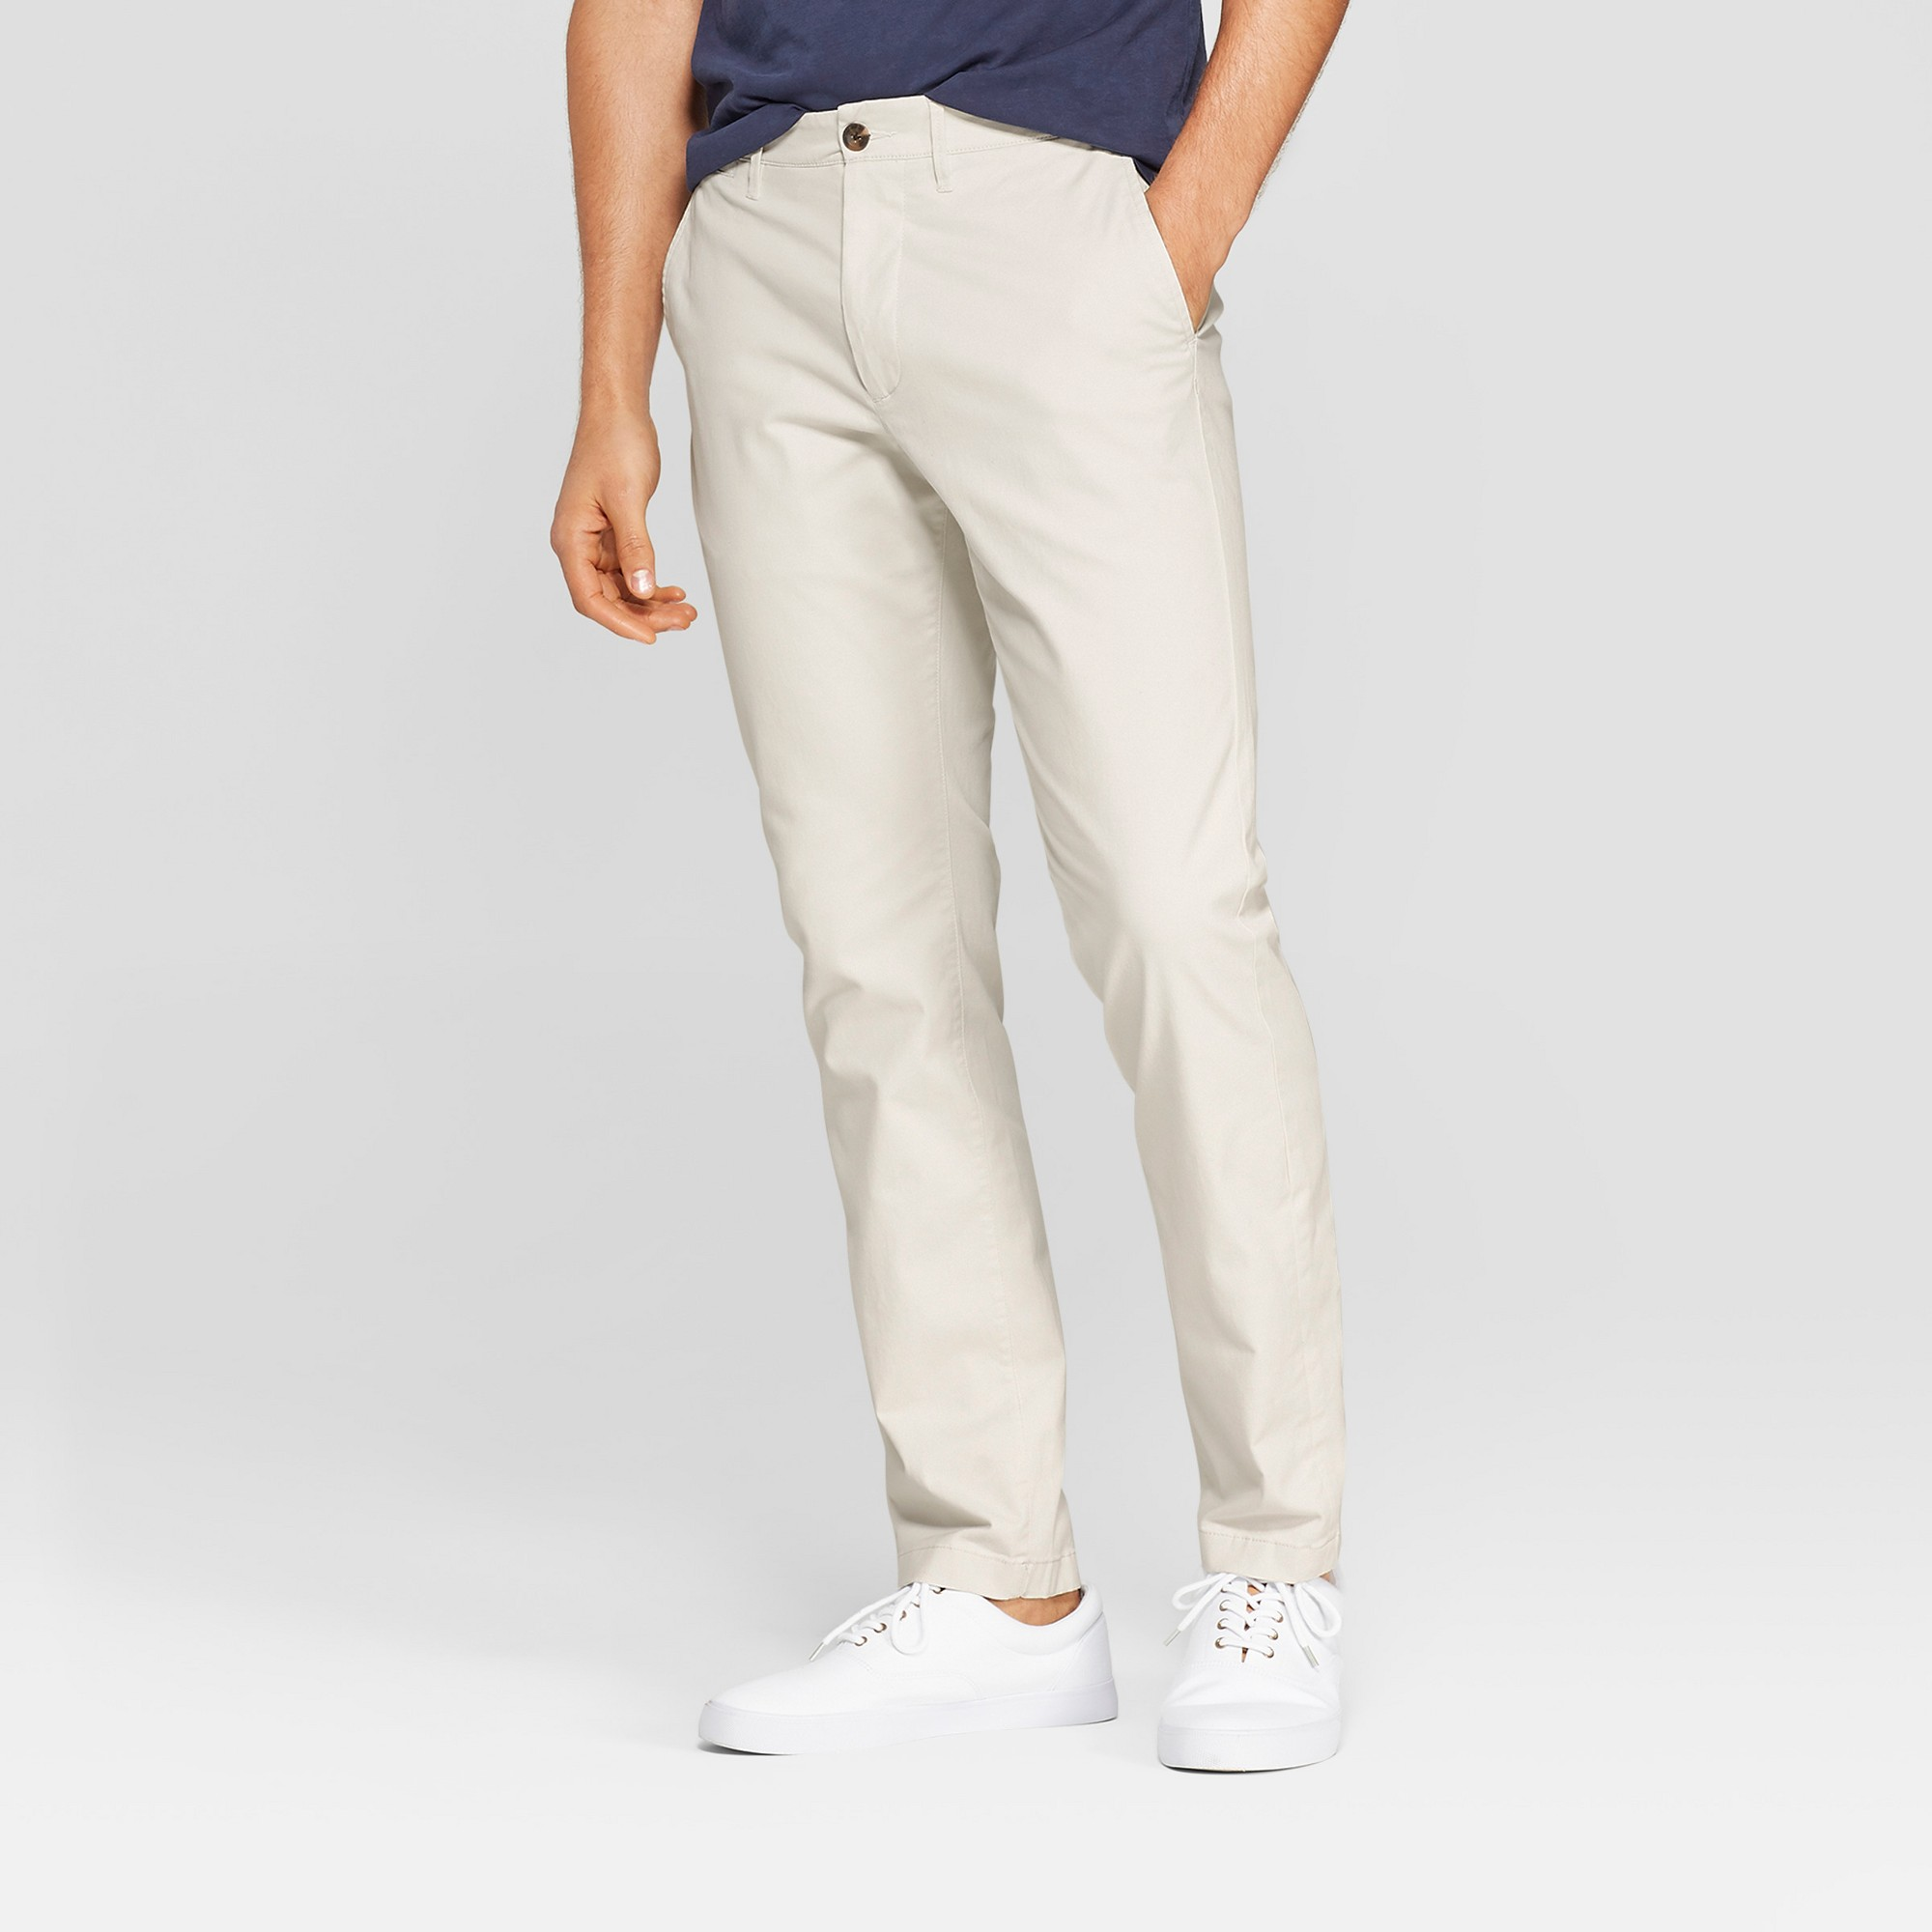 Men's 34 Regular Straight Fit Chino Pants - Goodfellow & Co Cream 33x30, White